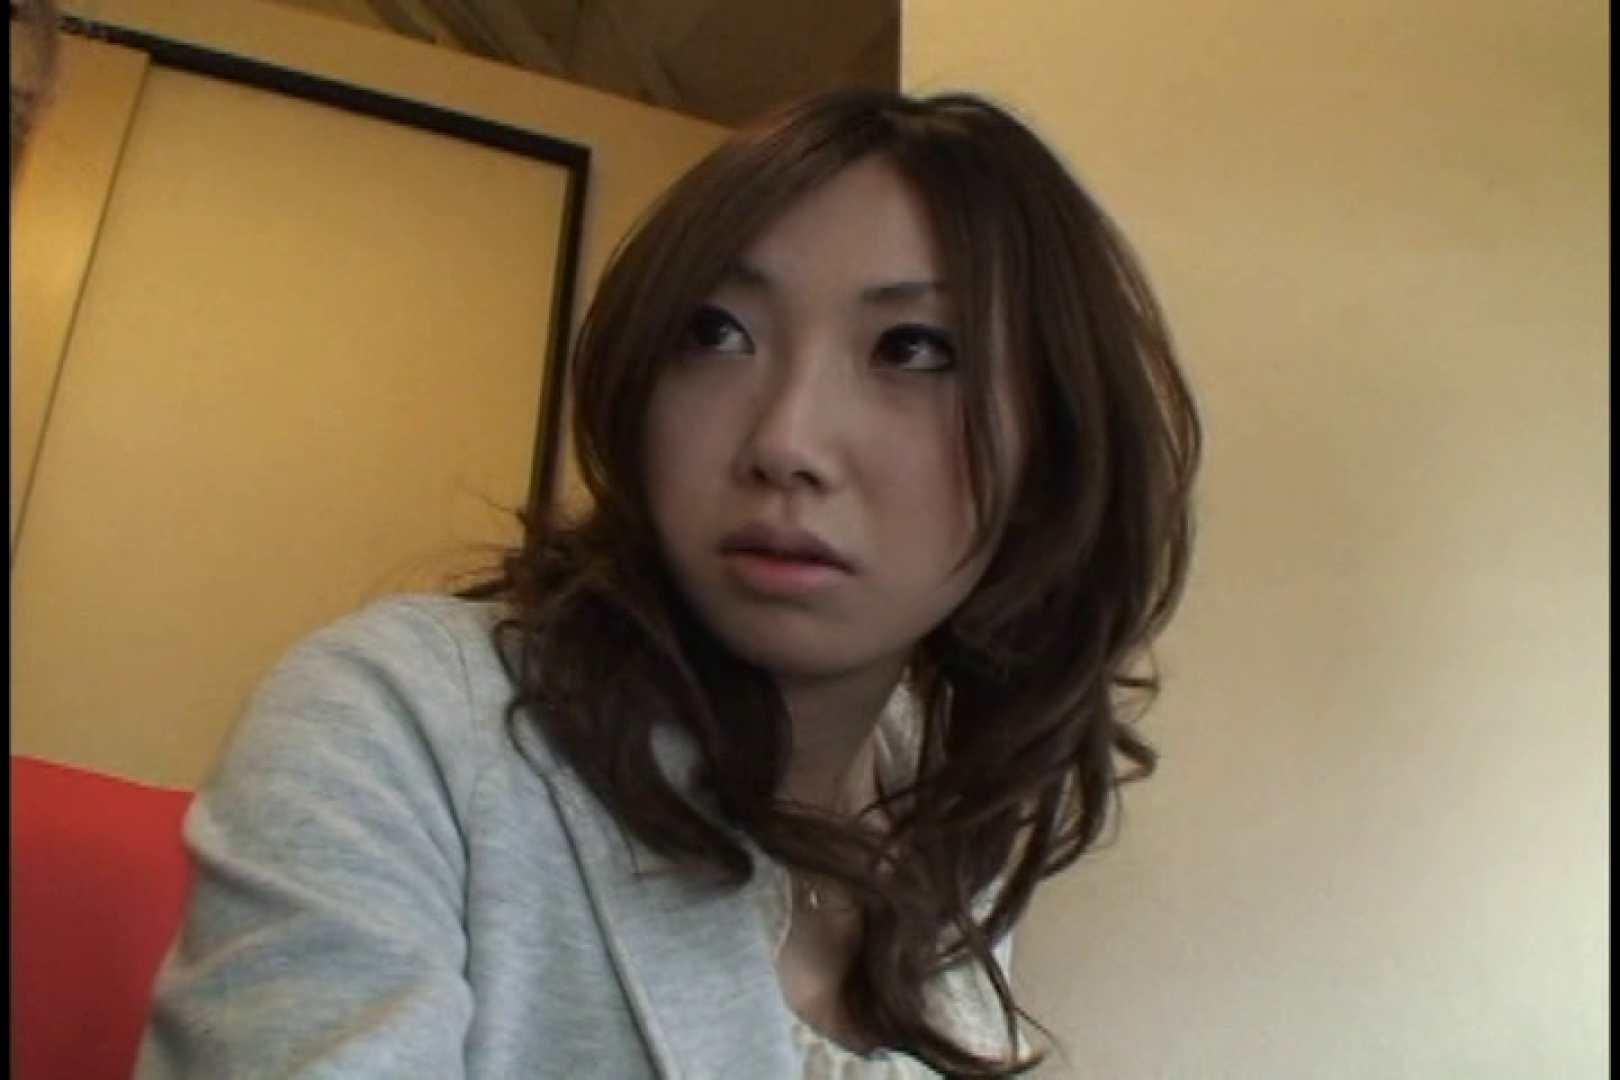 JDハンター全国ツアー vol.041 前編 女子大生のエロ動画  85PIX 4